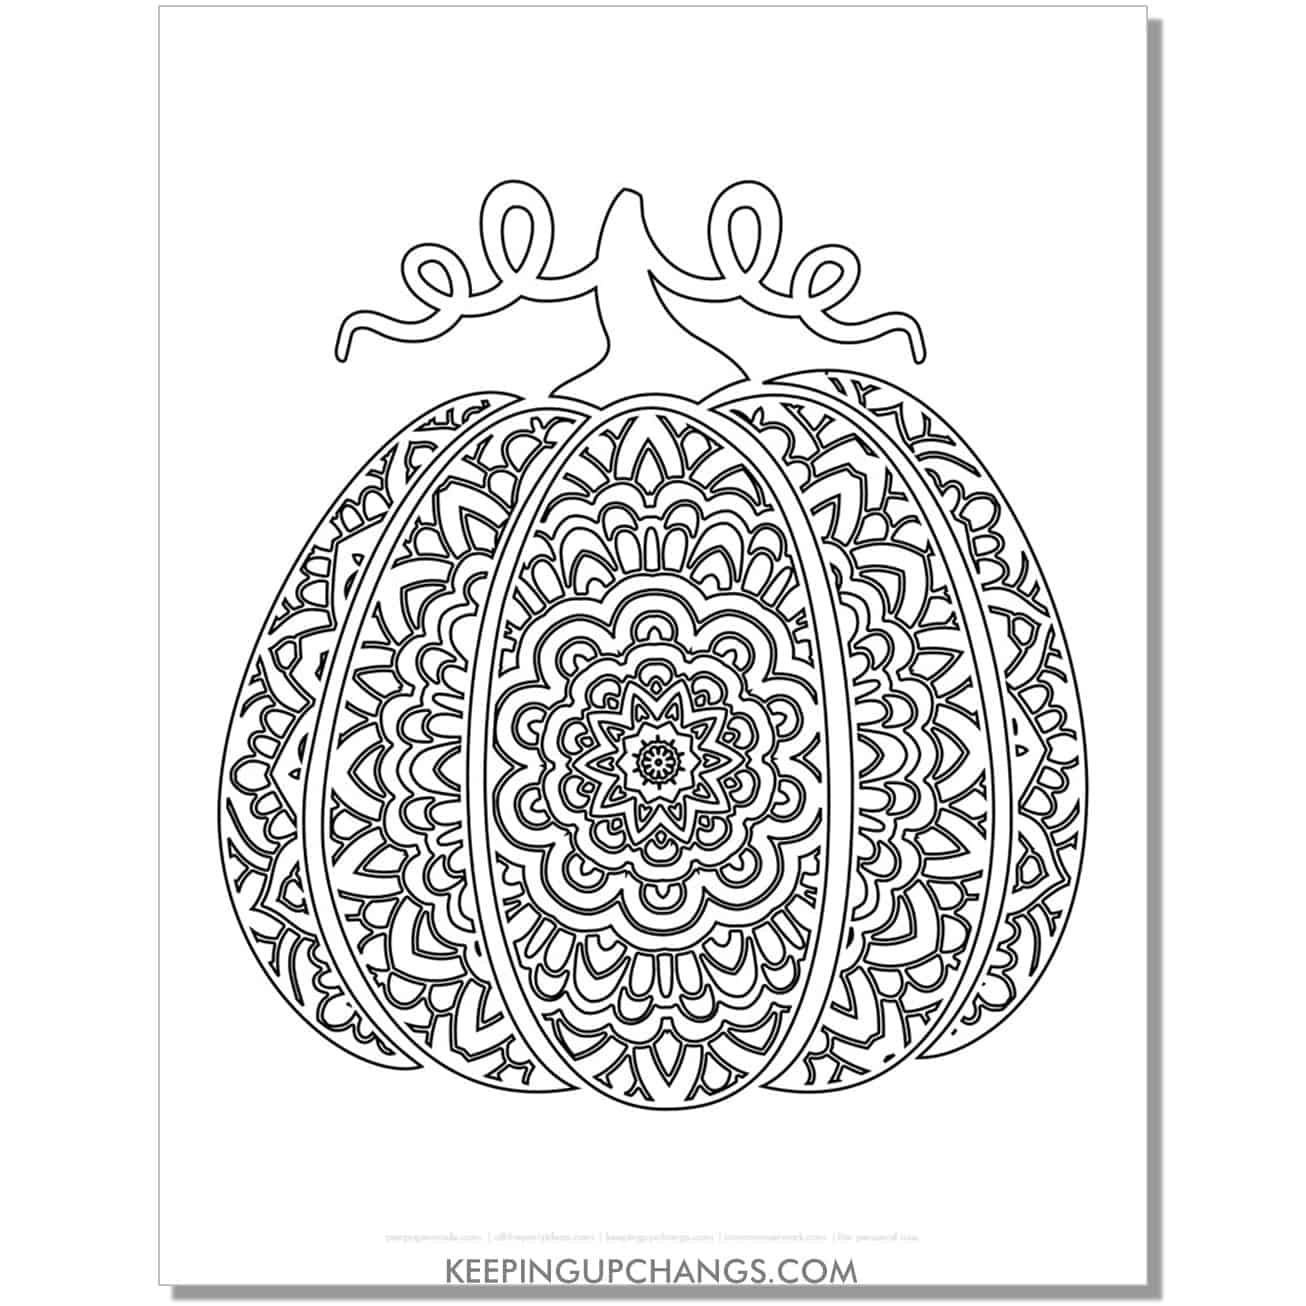 free mandala fall pumpkin coloring page for adults.